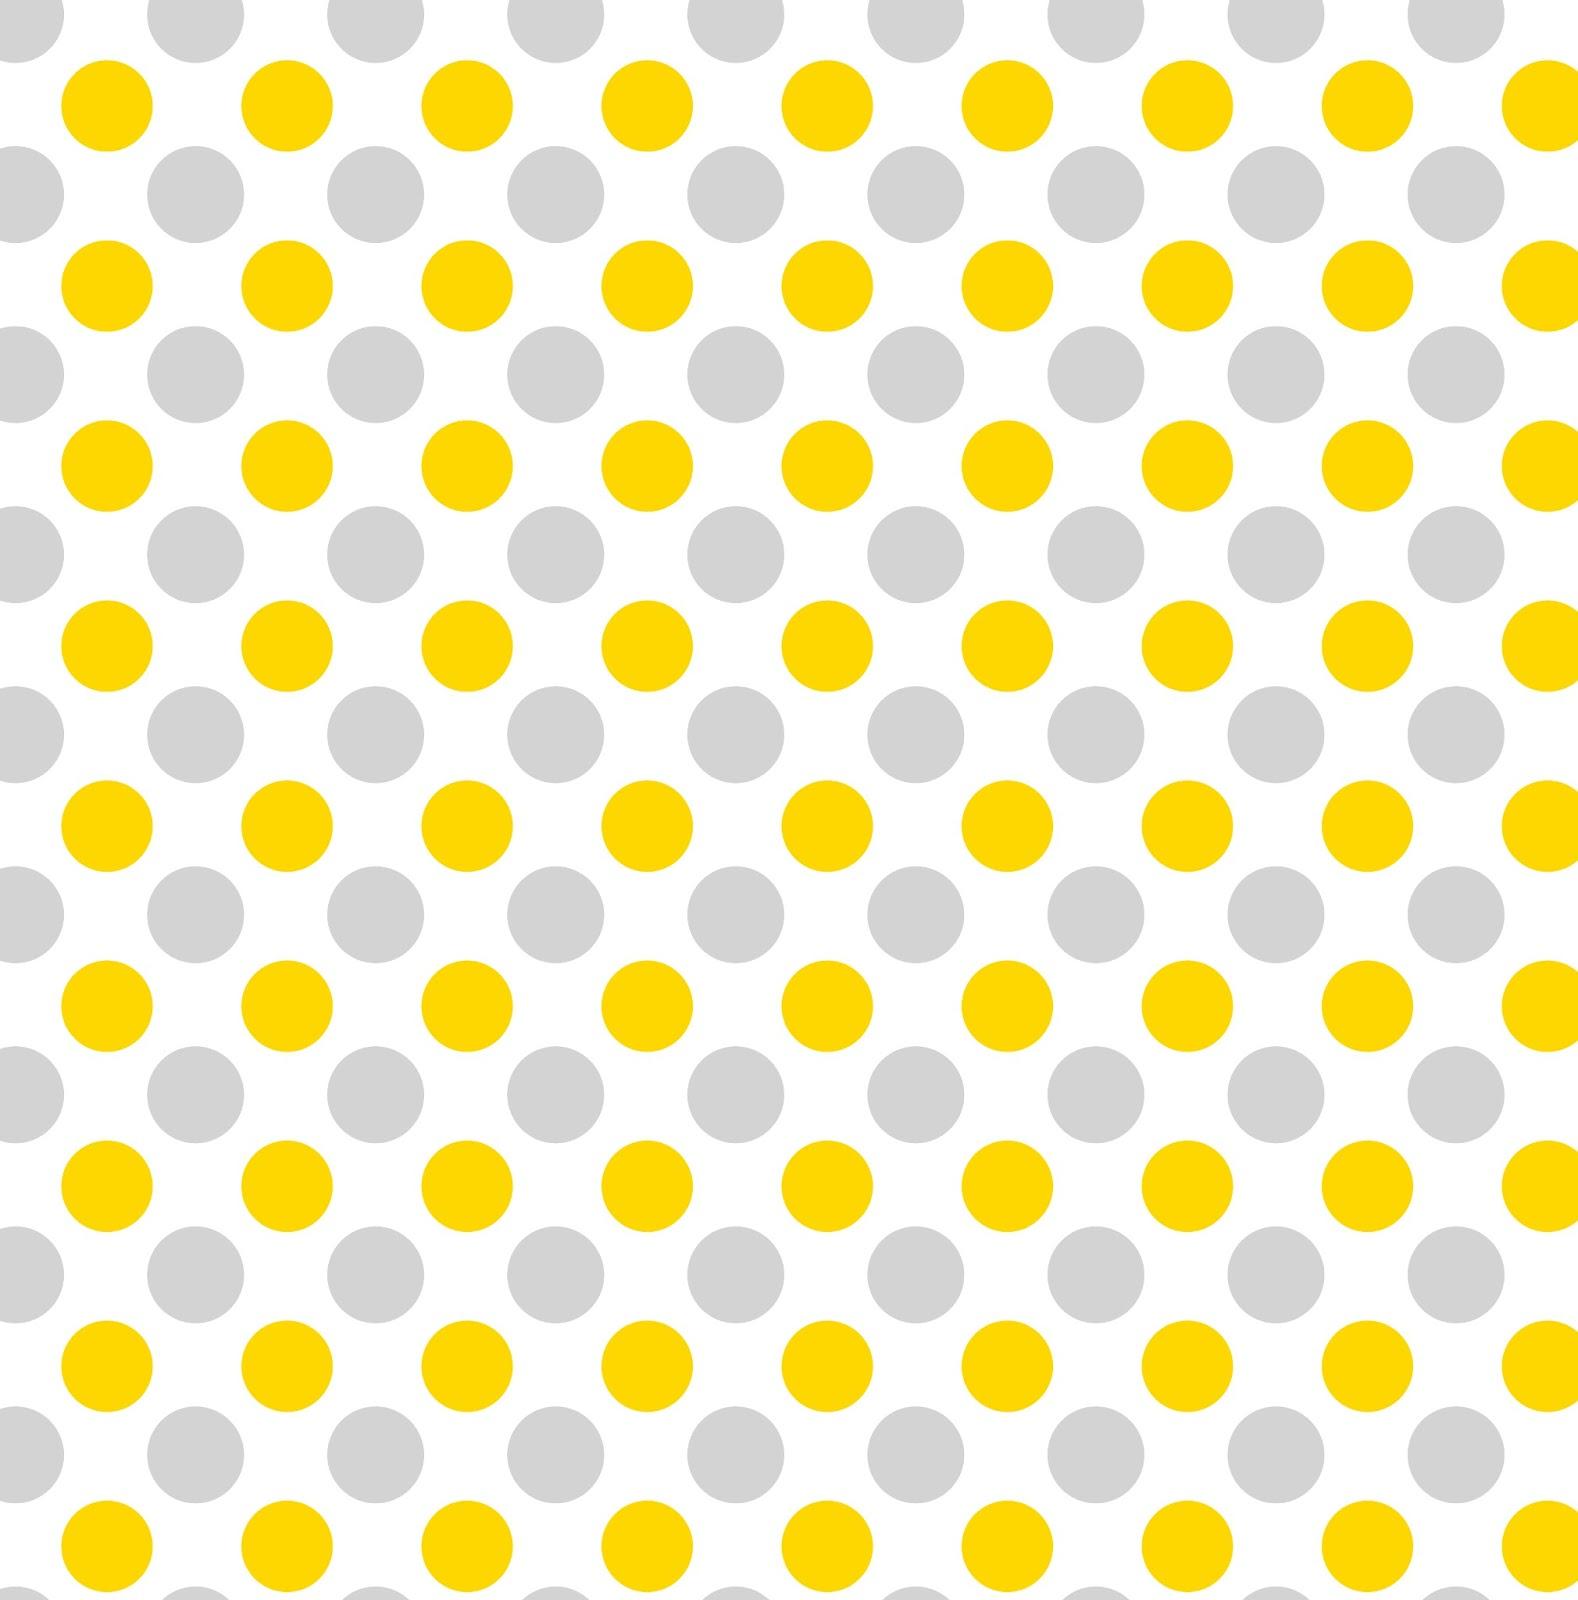 Free Polka Dot Background PNG - 153089